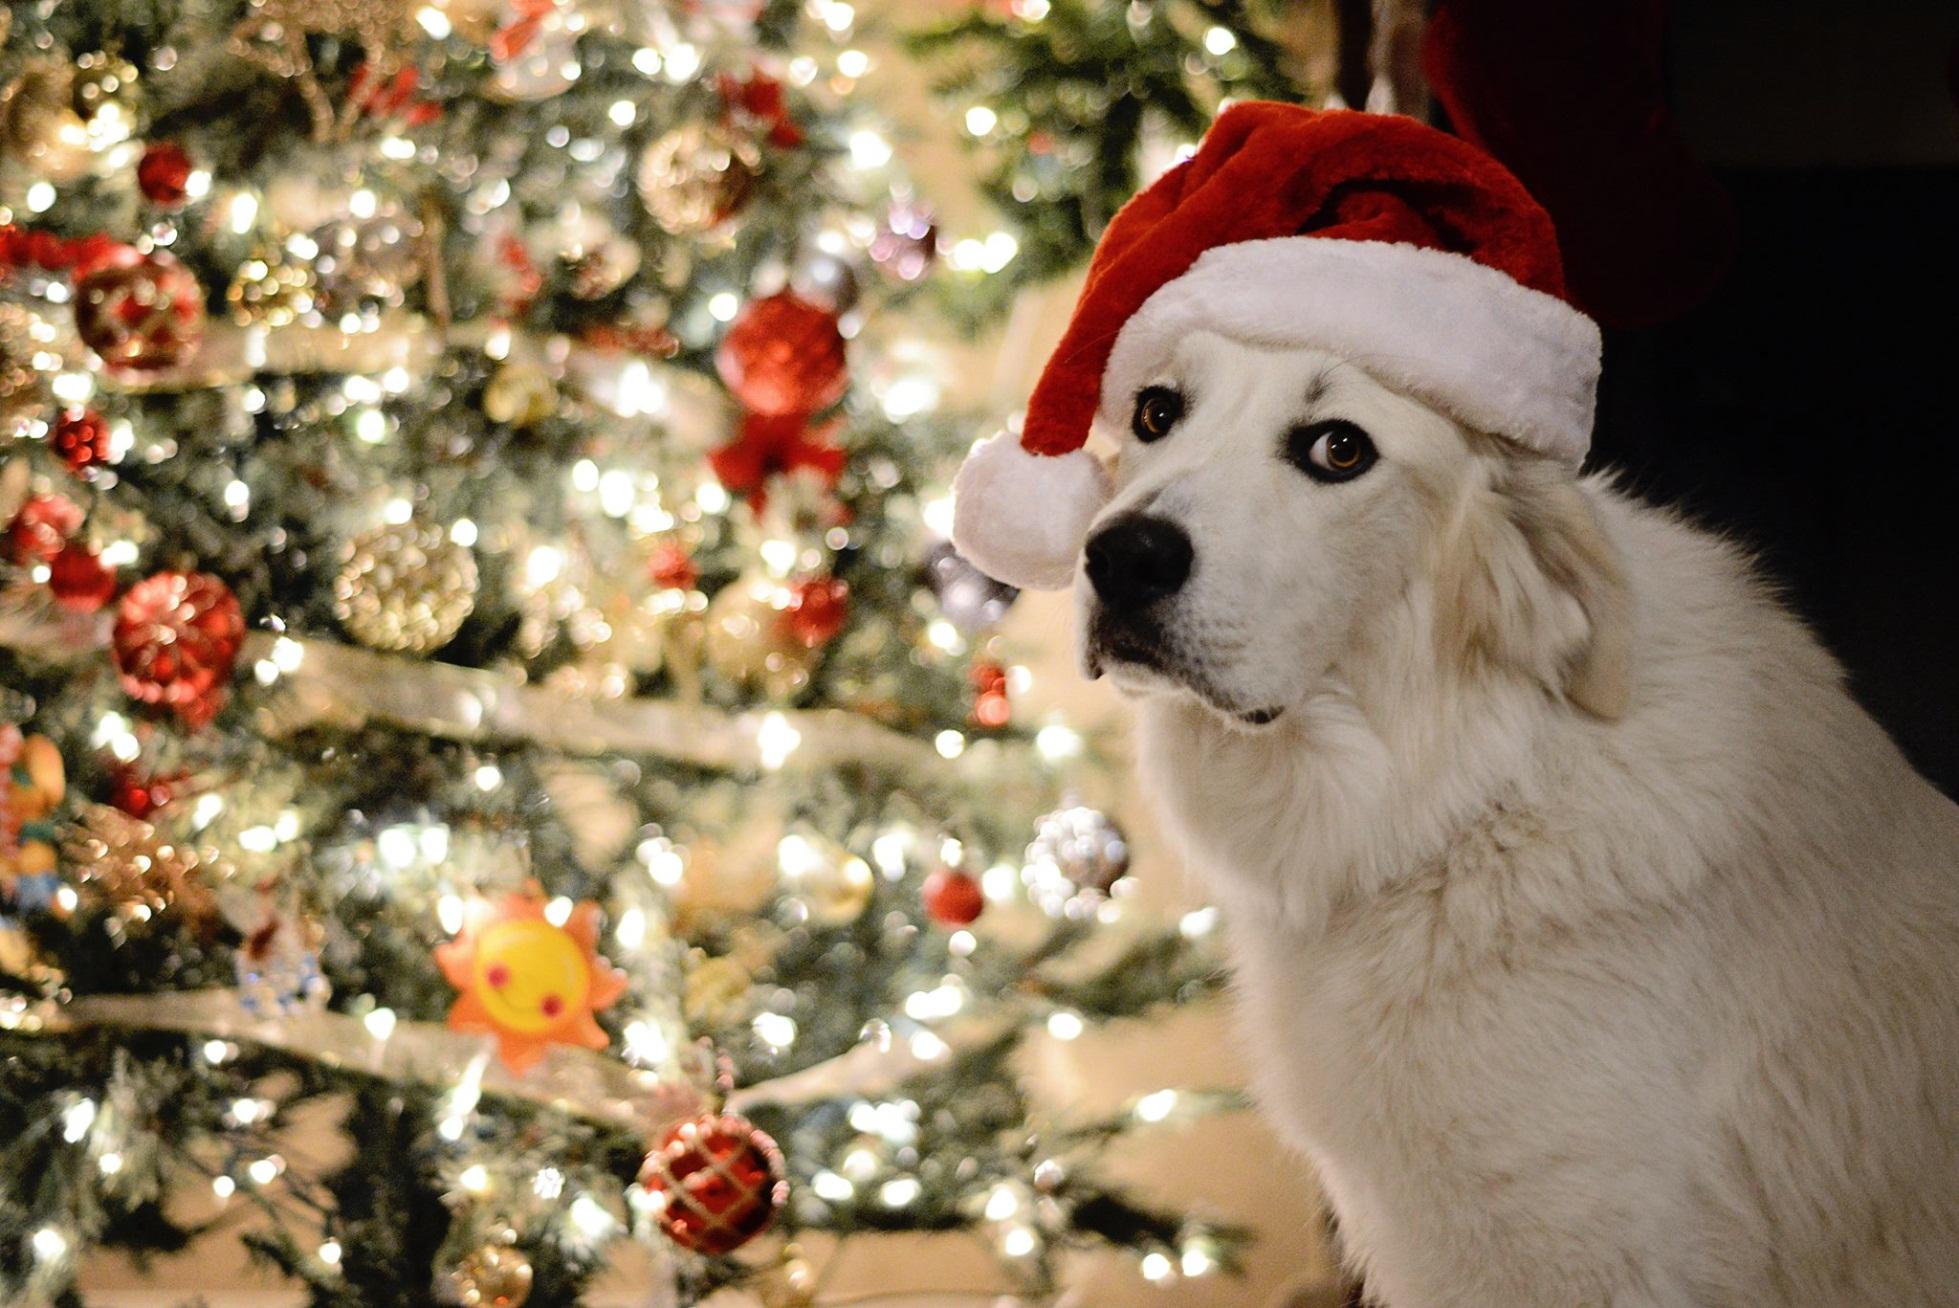 GPRA – Happy Holidays